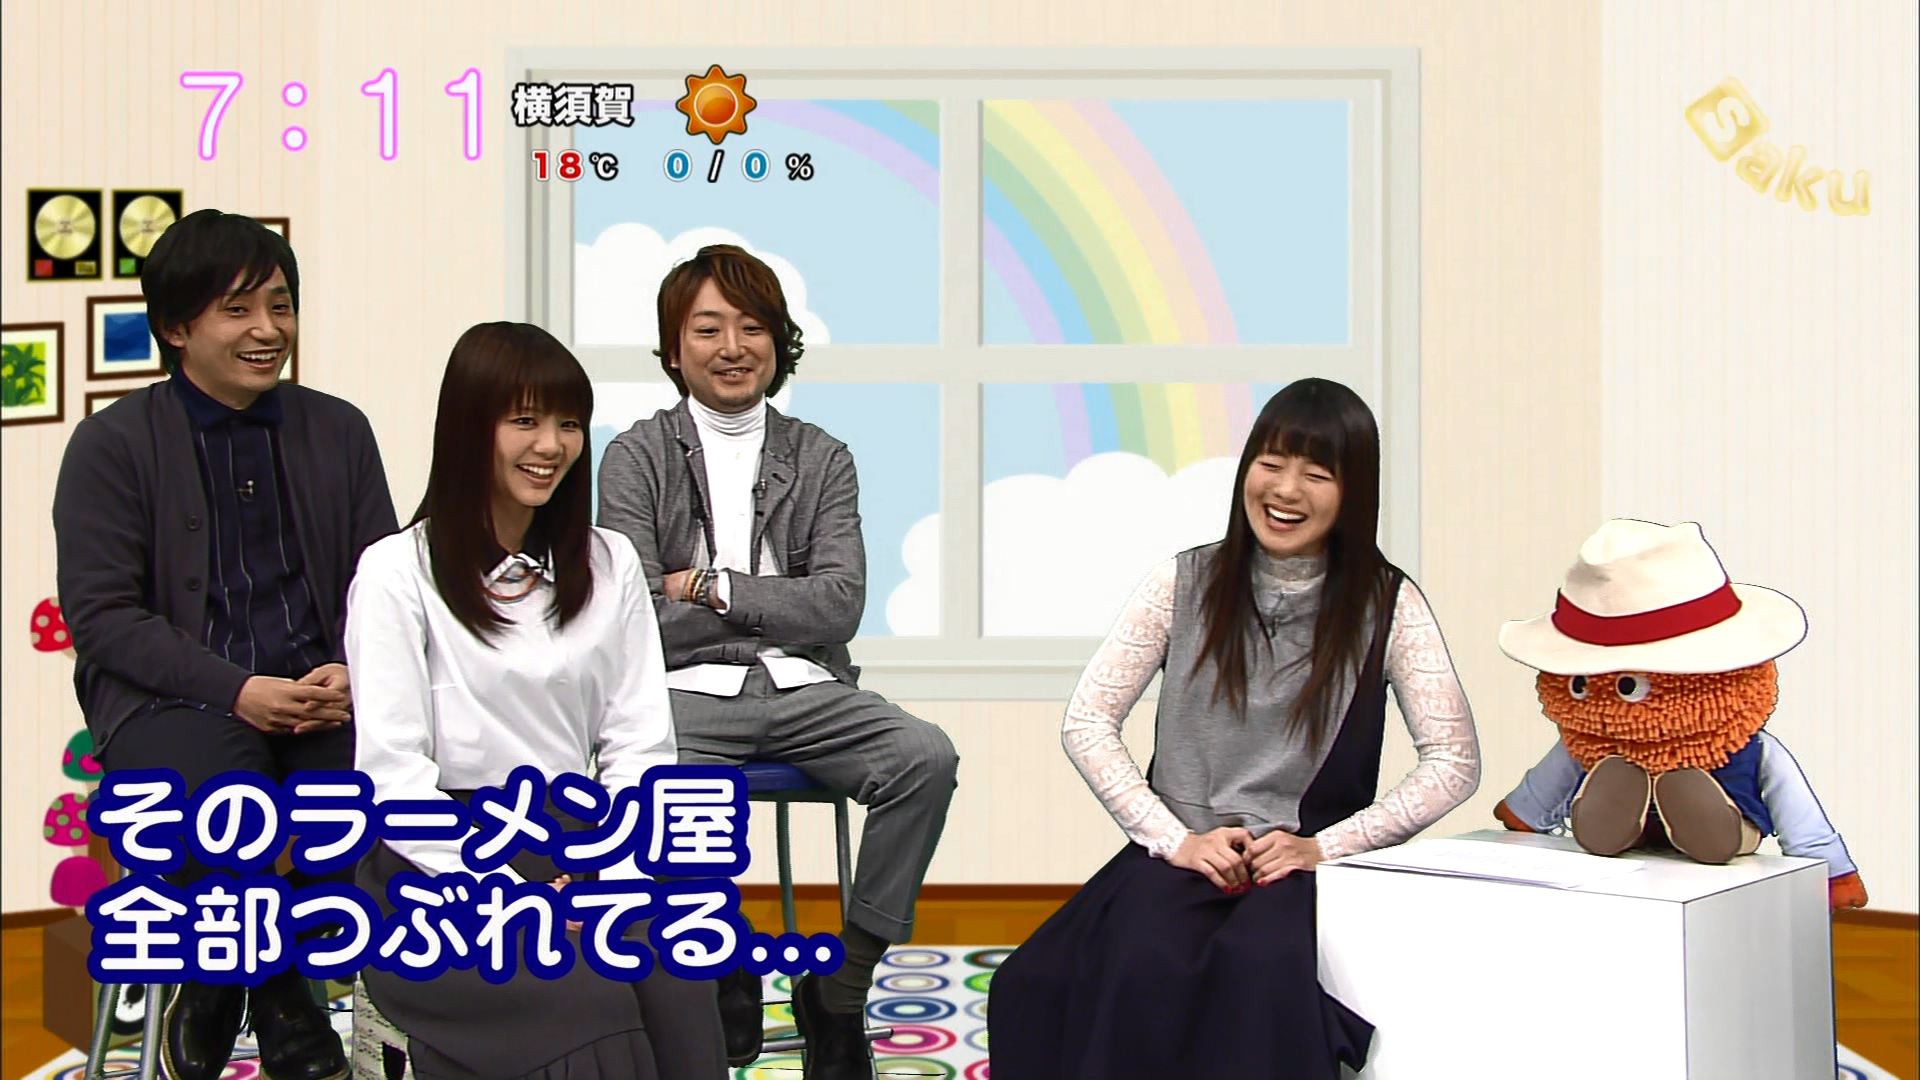 2016.03.17 いきものがかり(saku saku).ts_20160317_081205.929